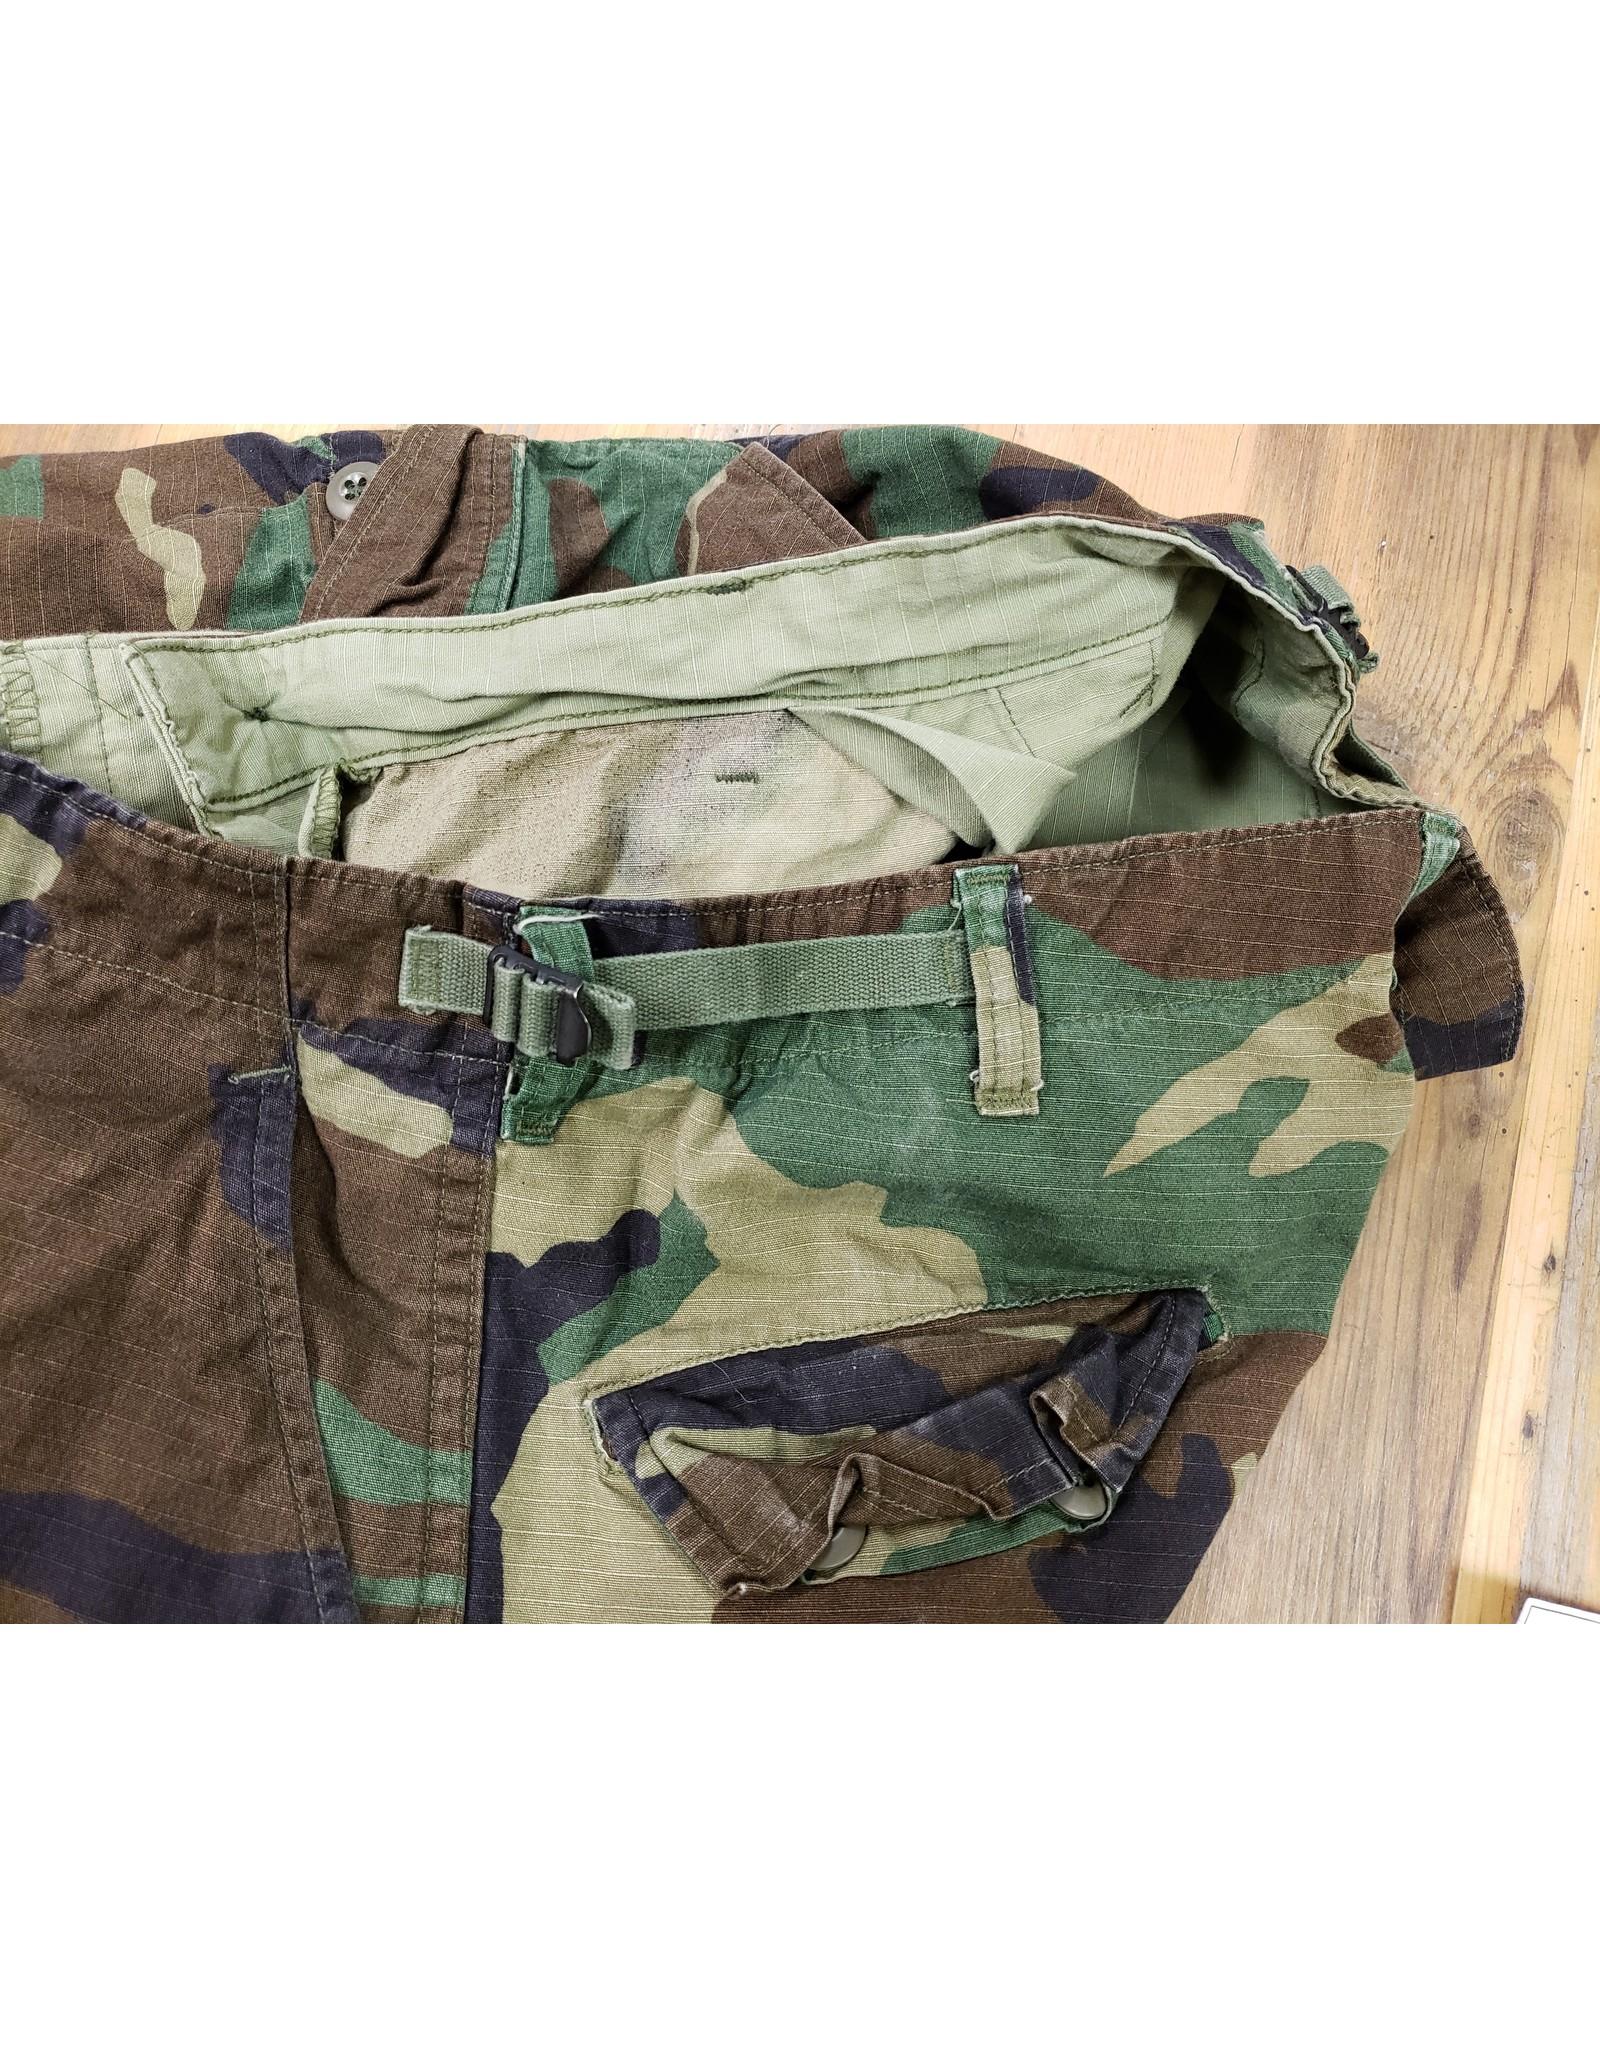 SURPLUS WOODLAND CAMO COMBAT PANTS